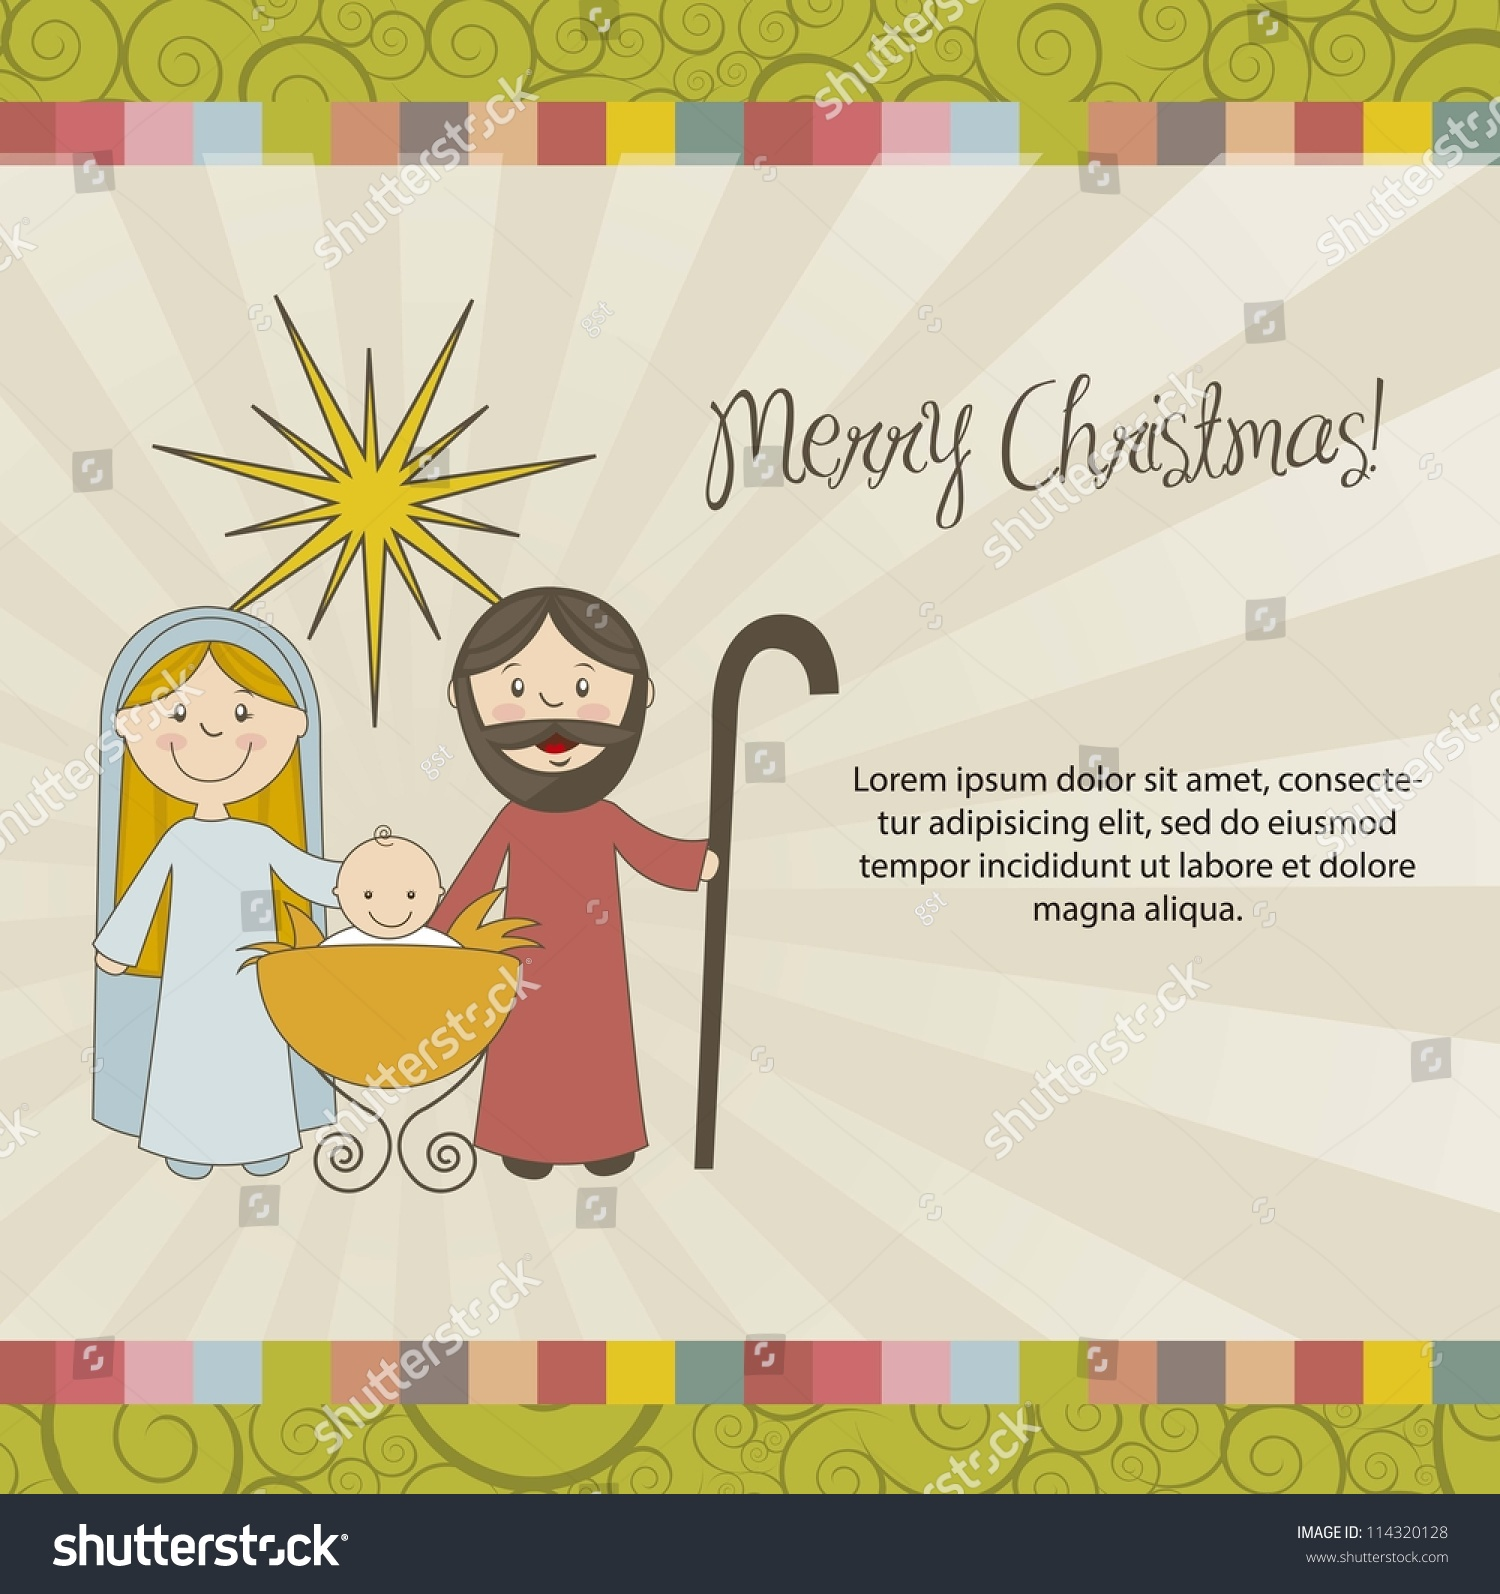 Christmas Card Nativity Scene Vintage Style Stock Vector (Royalty ...